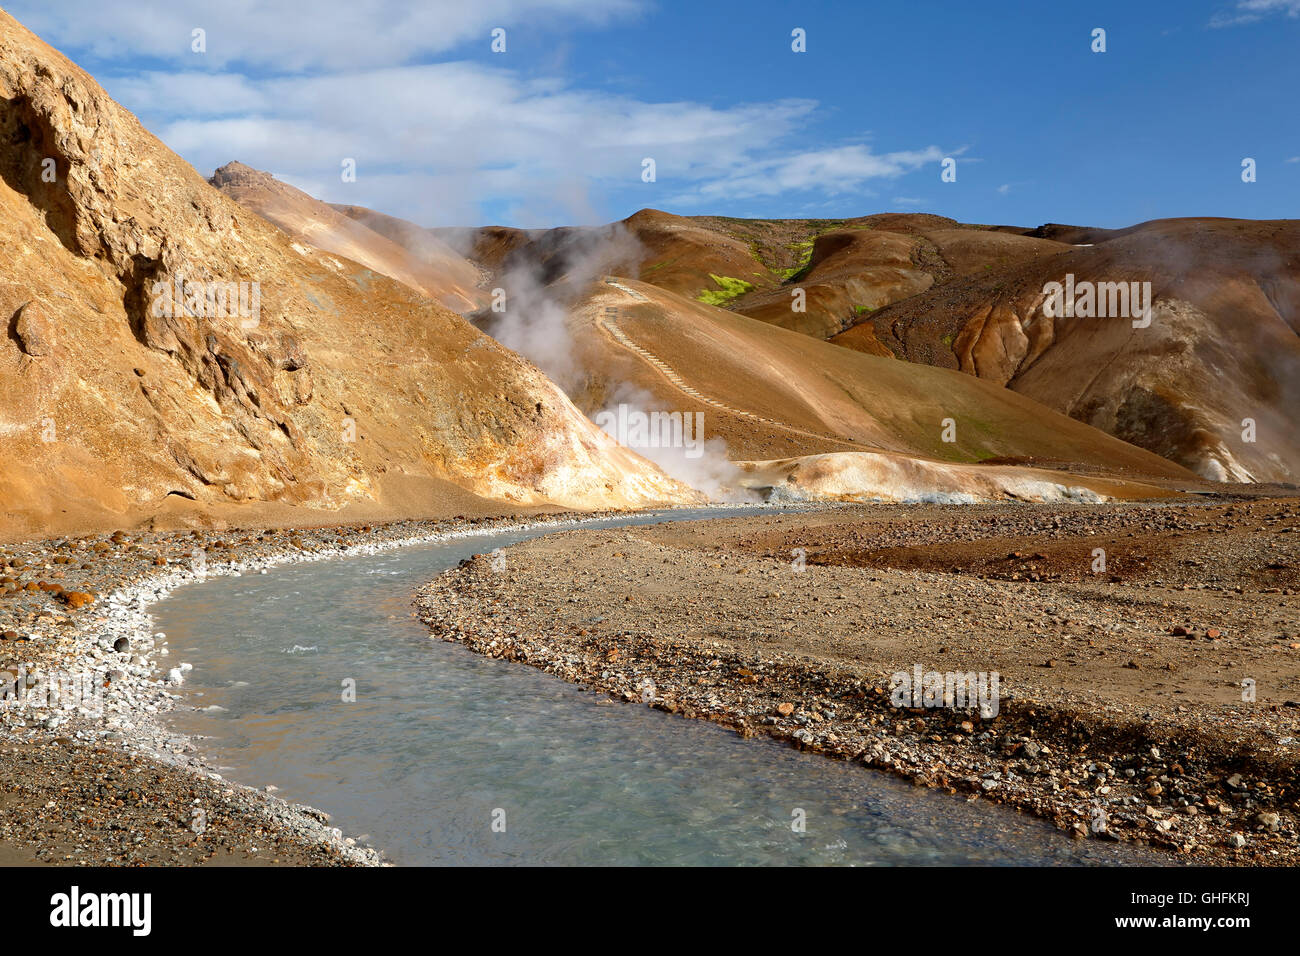 Rhyolite mountains, stream and fumaroles, Kerlingarfjoll, Iceland - Stock Image